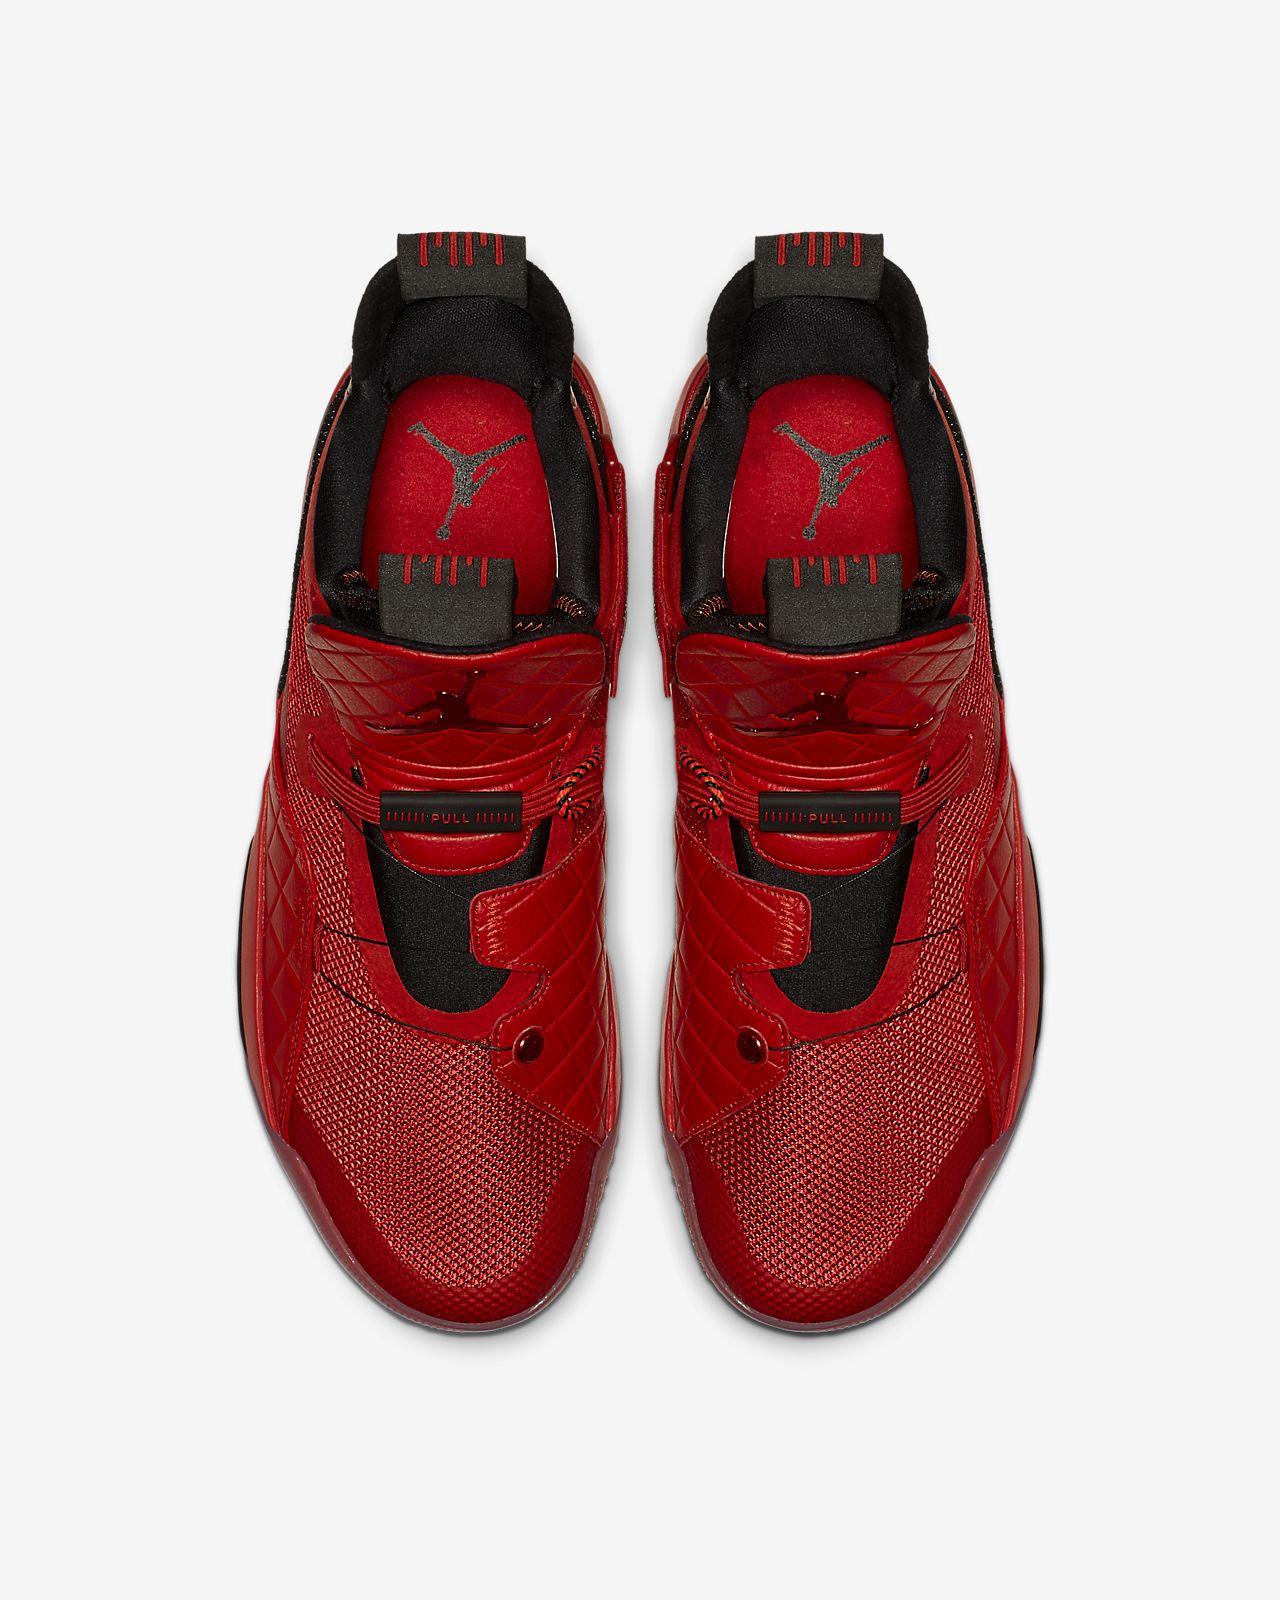 602e199aa7190 Air Jordan XXXIII Zapatillas de baloncesto - Hombre. Nike.com ES